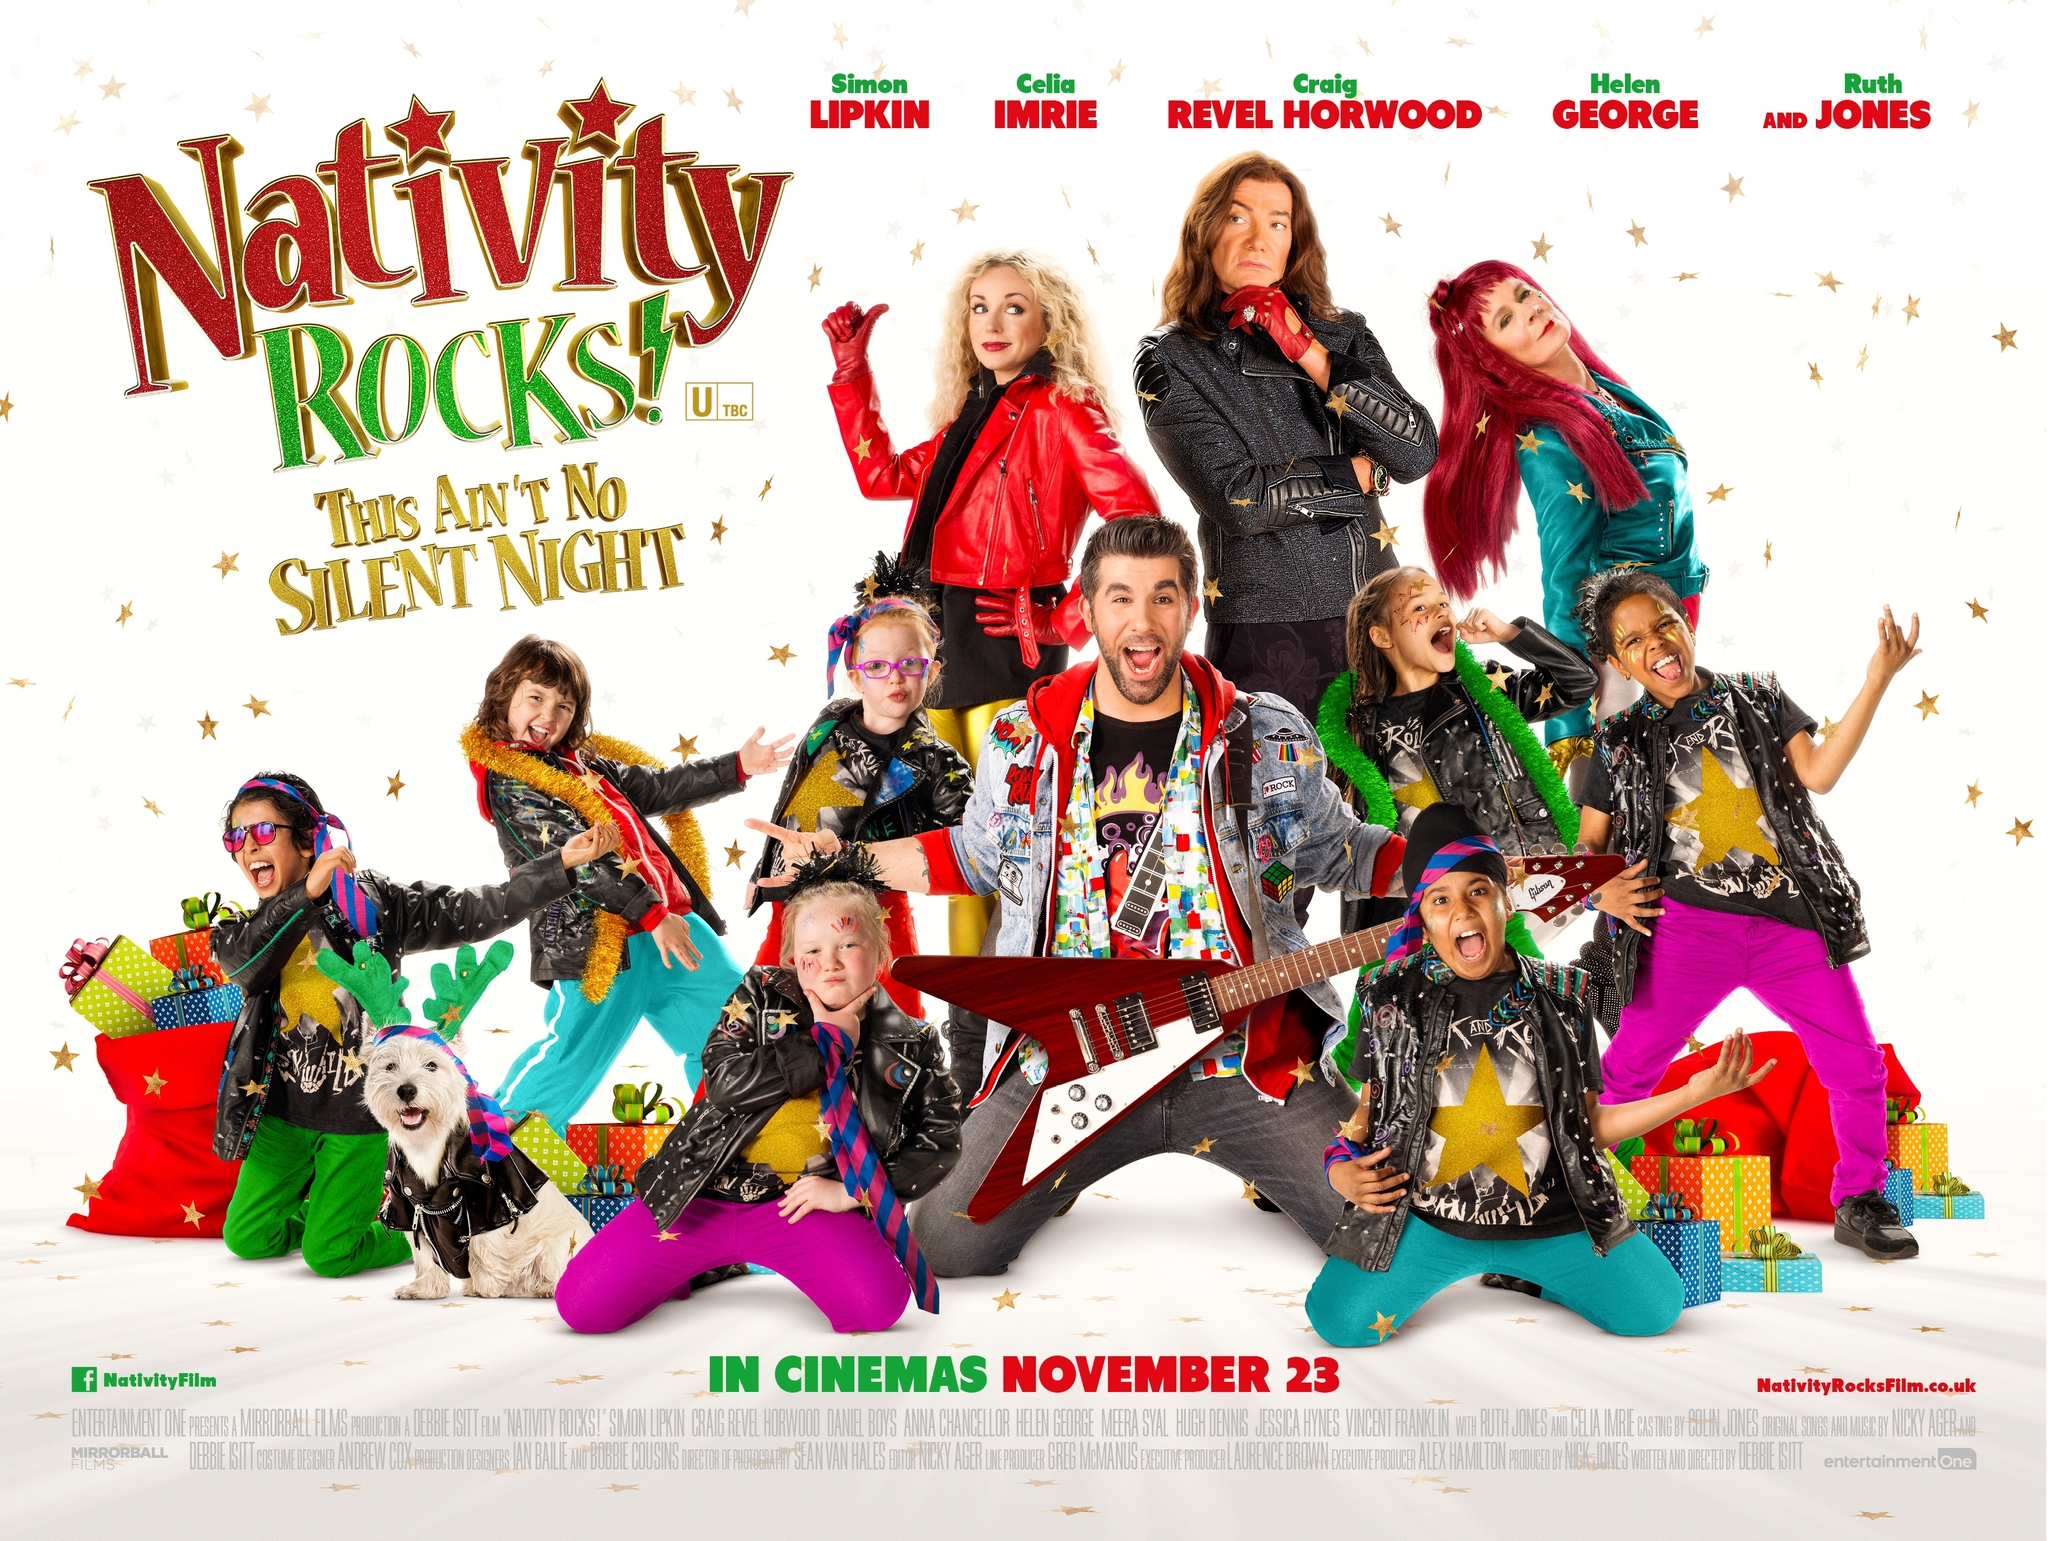 Celia Imrie, Craig Revel Horwood, Helen George, and Simon Lipkin in Nativity Rocks! (2018)